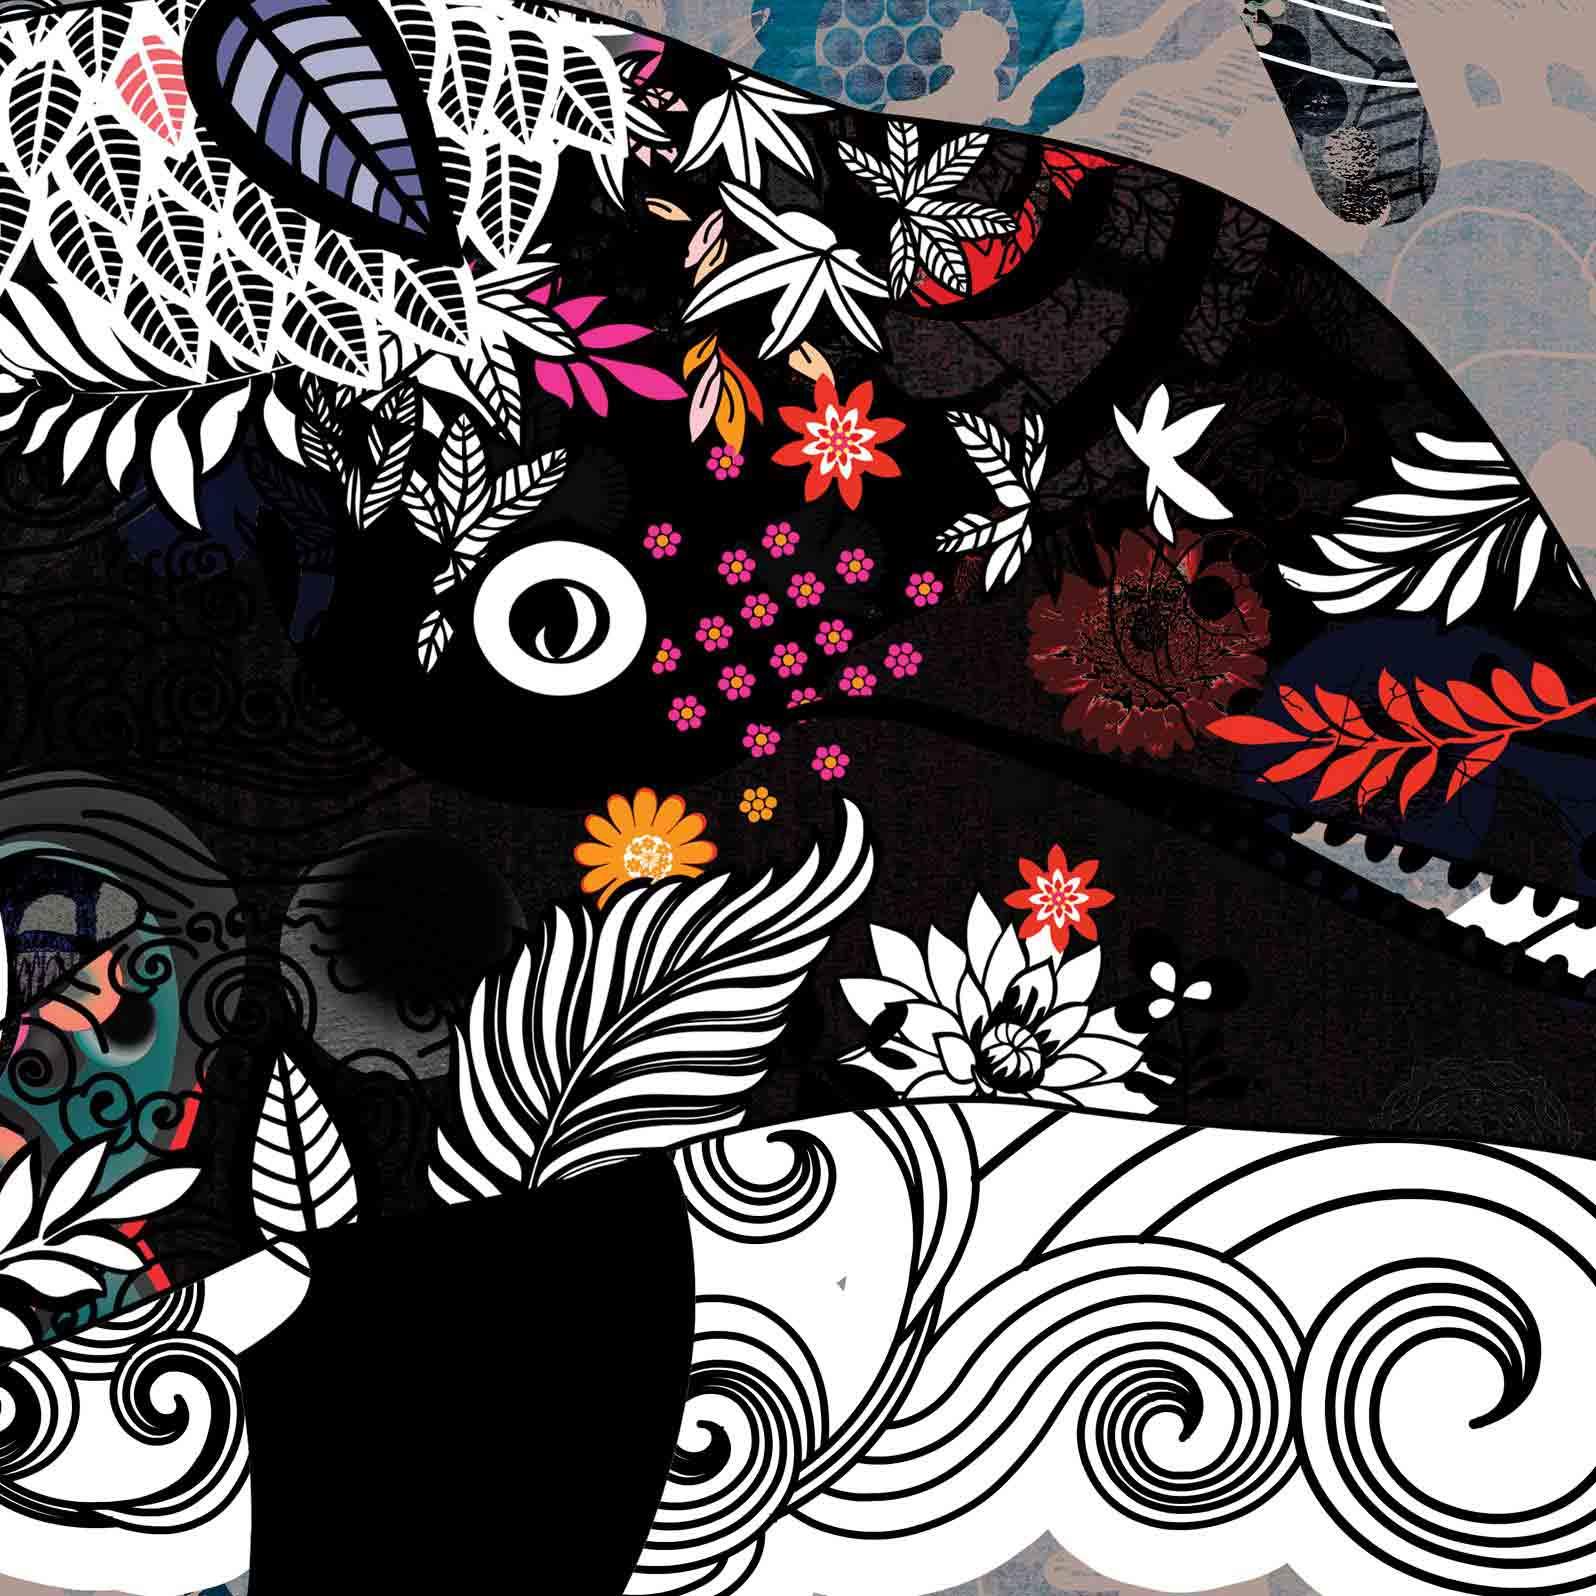 Anca Stefanescu | Flying Dolphin Digital Art, Print On Canvas